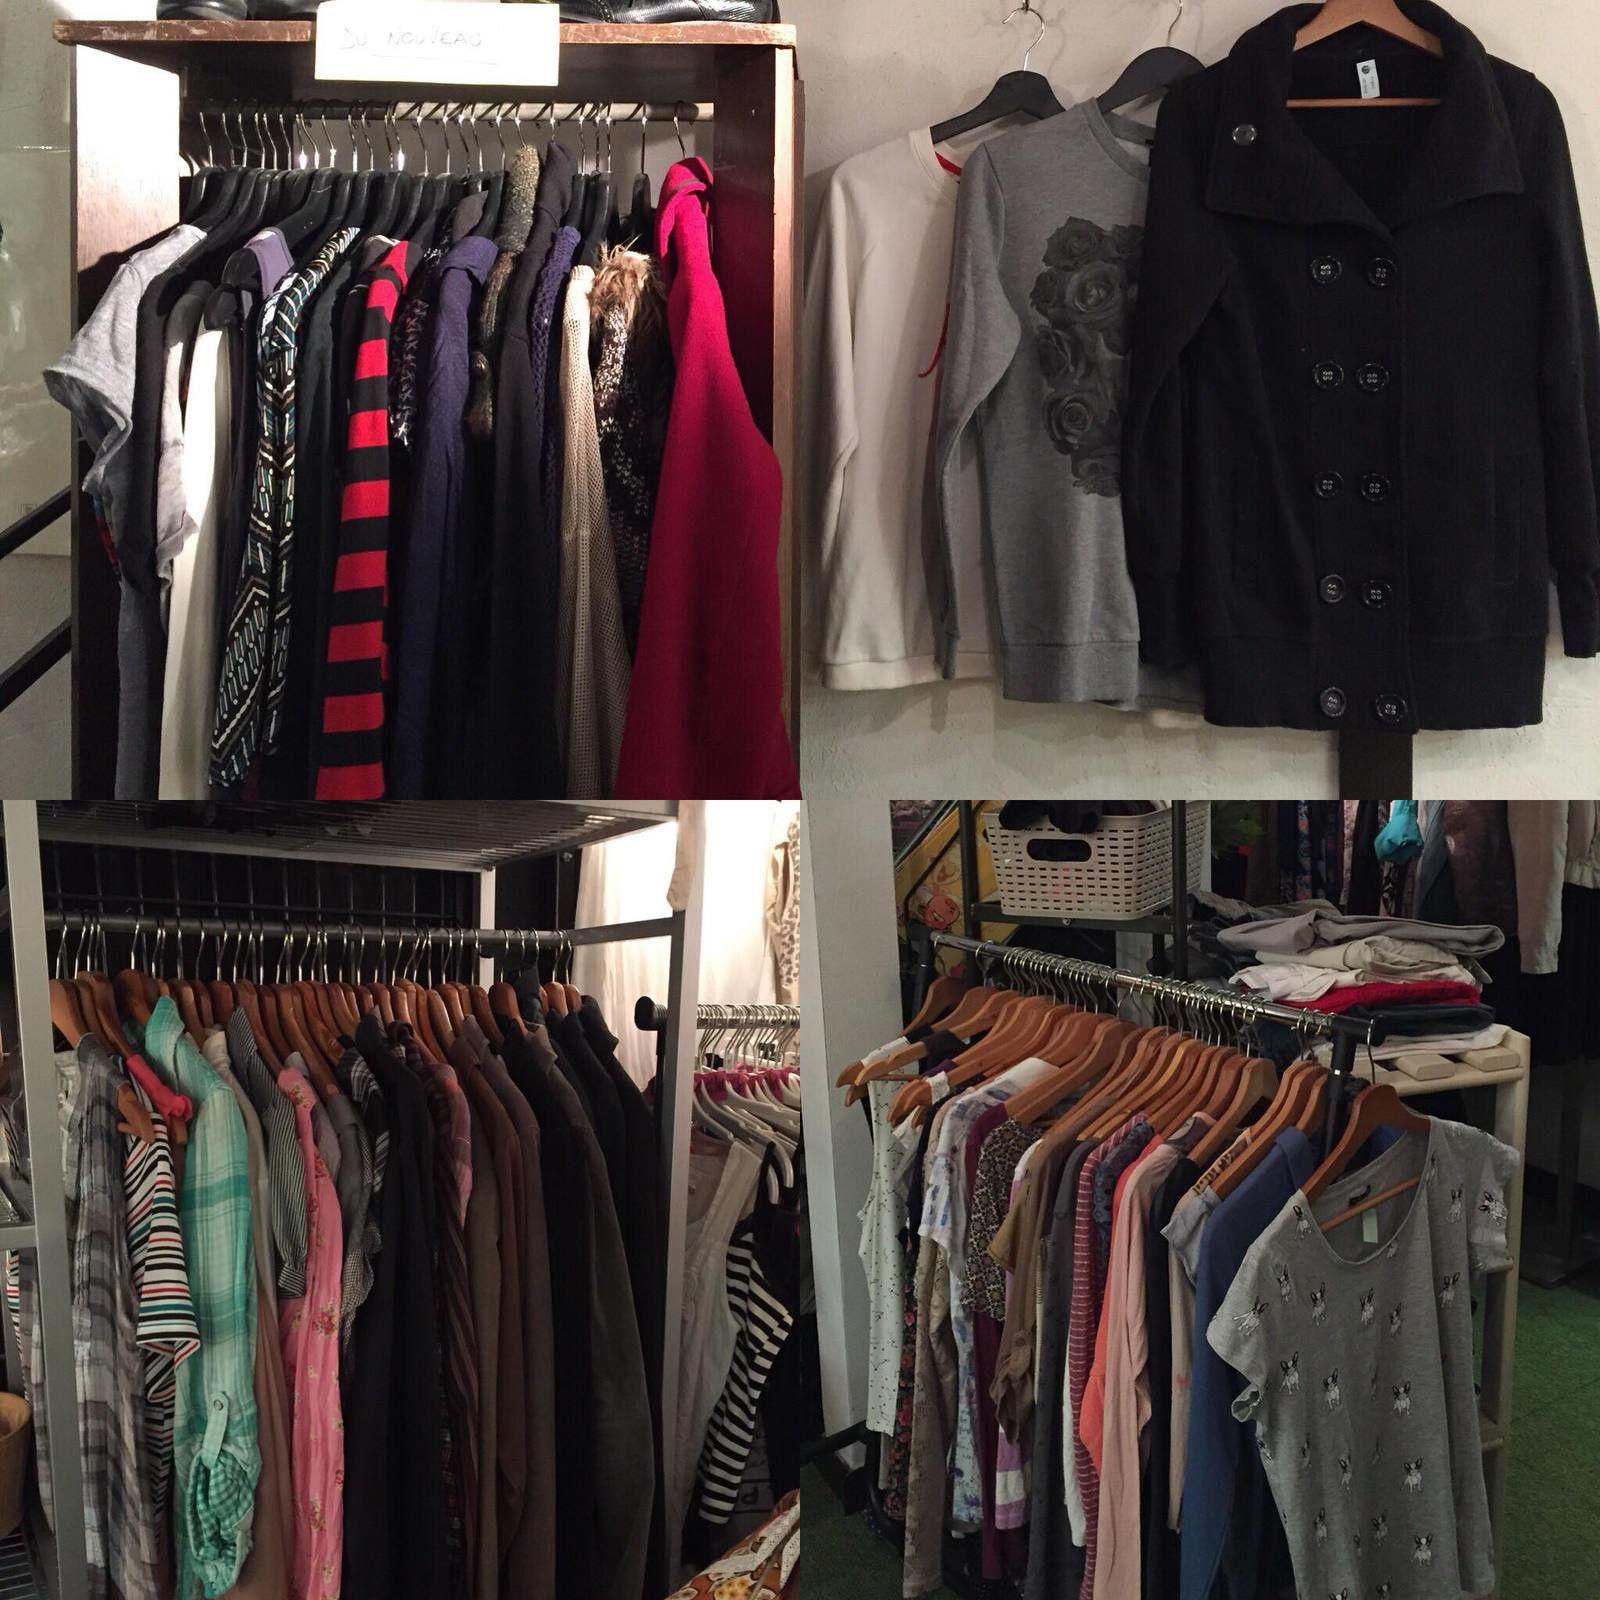 VIDE DRESSING & APÉRO #34 - Vendredi 30 Novembre 2018 de 18h00 à 21h30 ...